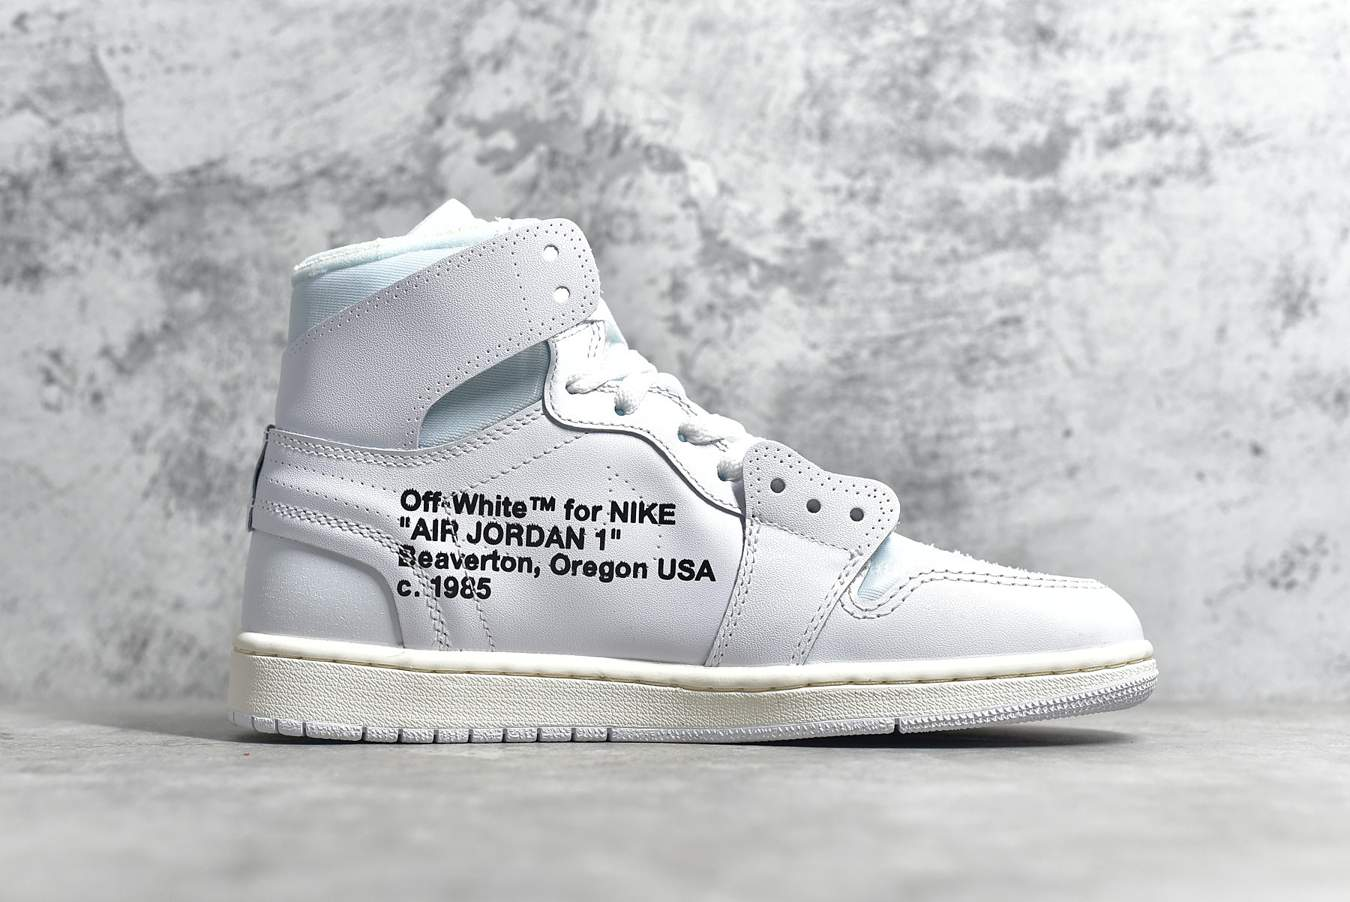 Заказать поиск кроссовок Jordan 1 Retro High Off-White White